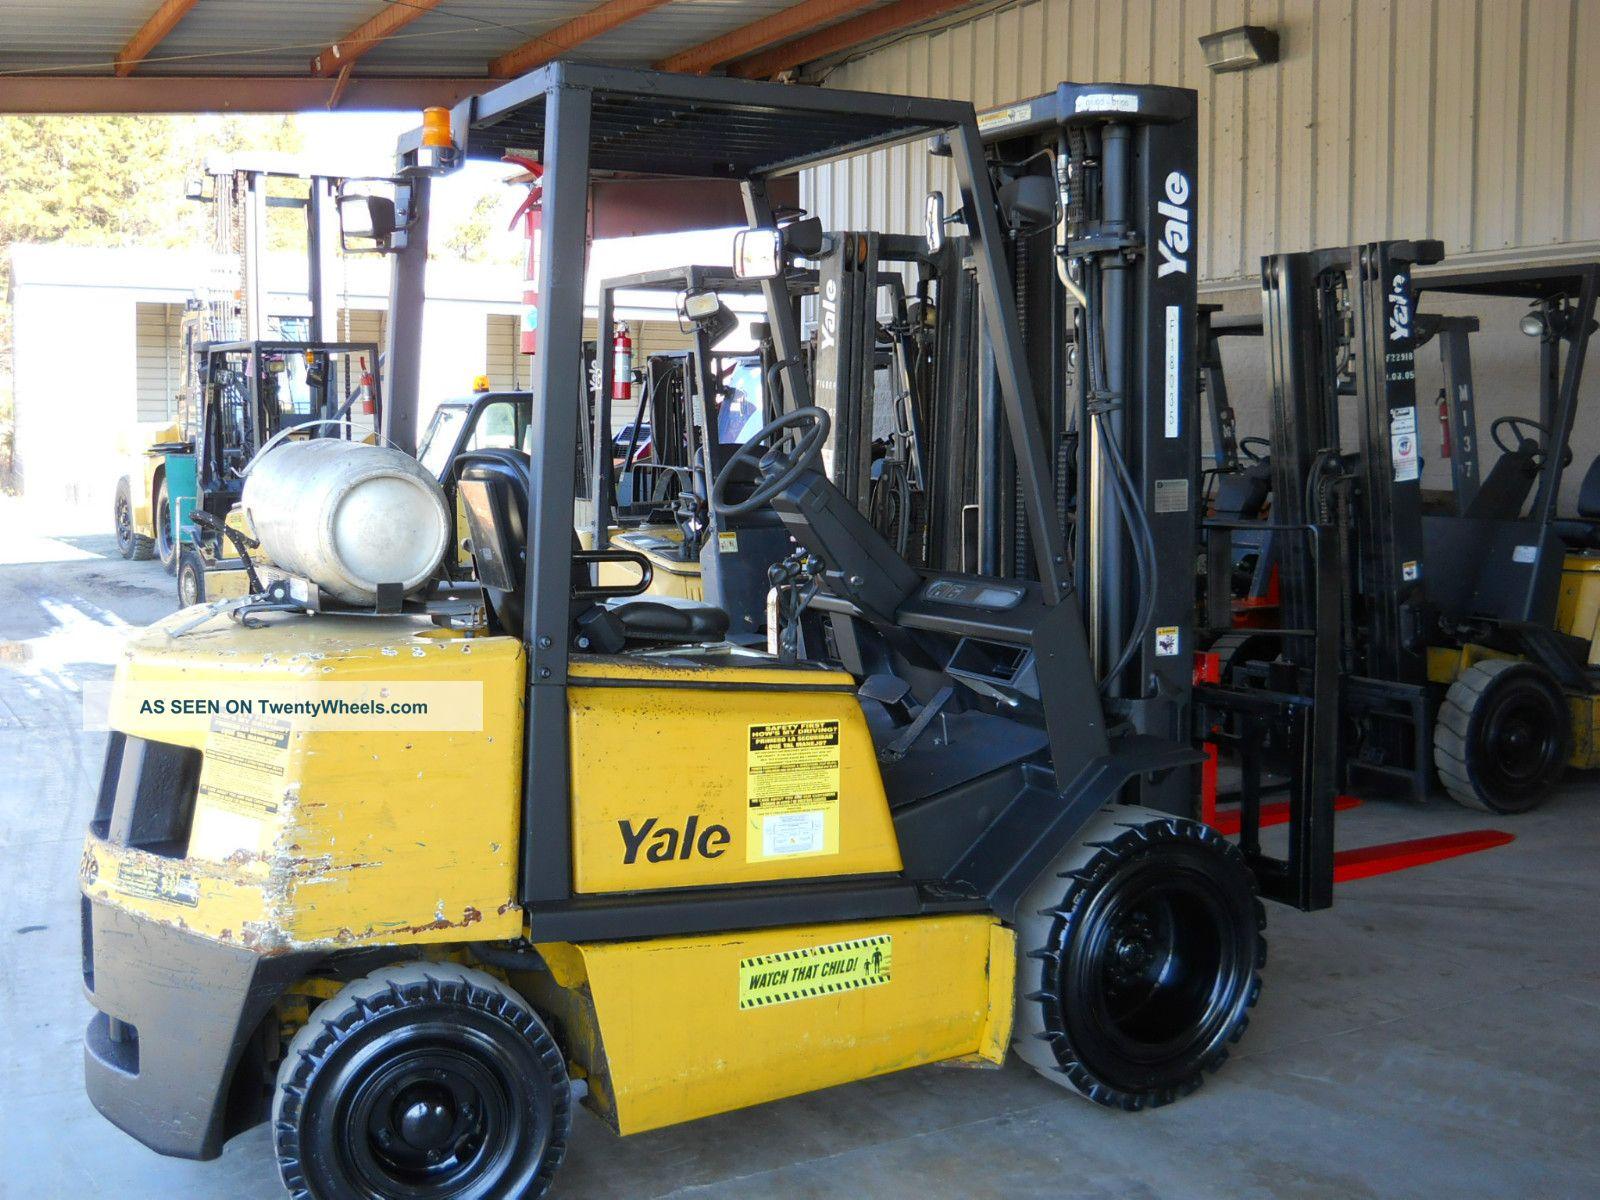 Yale Forklift Glp050 Manual Cub Cadet Manual Sleeve Hitch Fertilizer Cub Cadet Gt Service